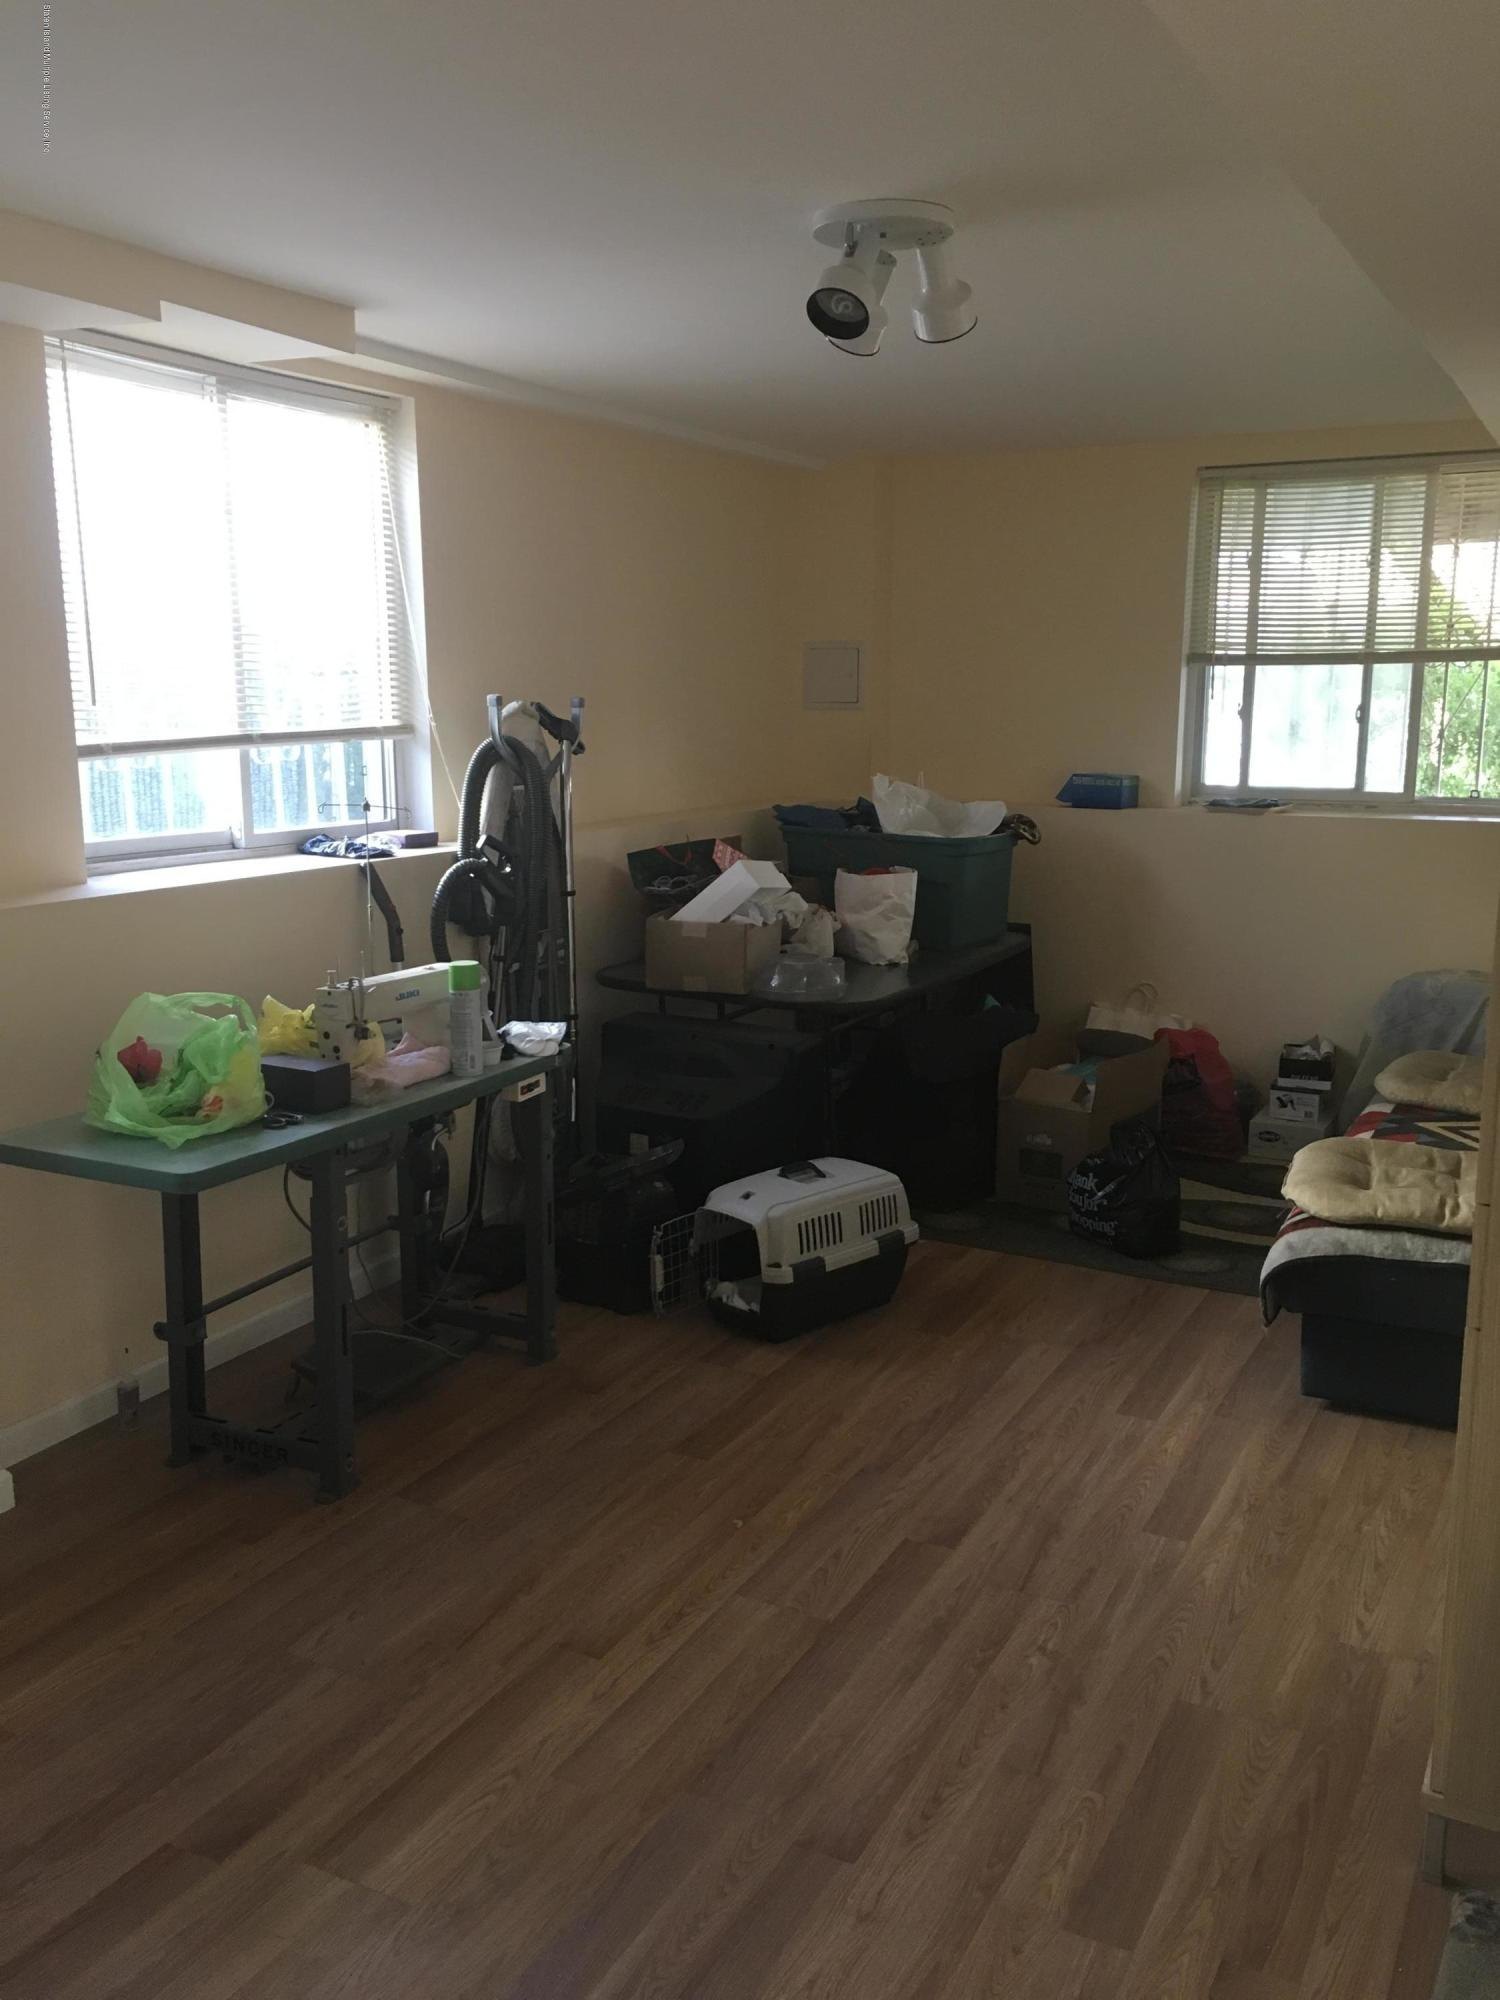 Single Family - Semi-Attached 190 Moreland Street  Staten Island, NY 10306, MLS-1123255-14